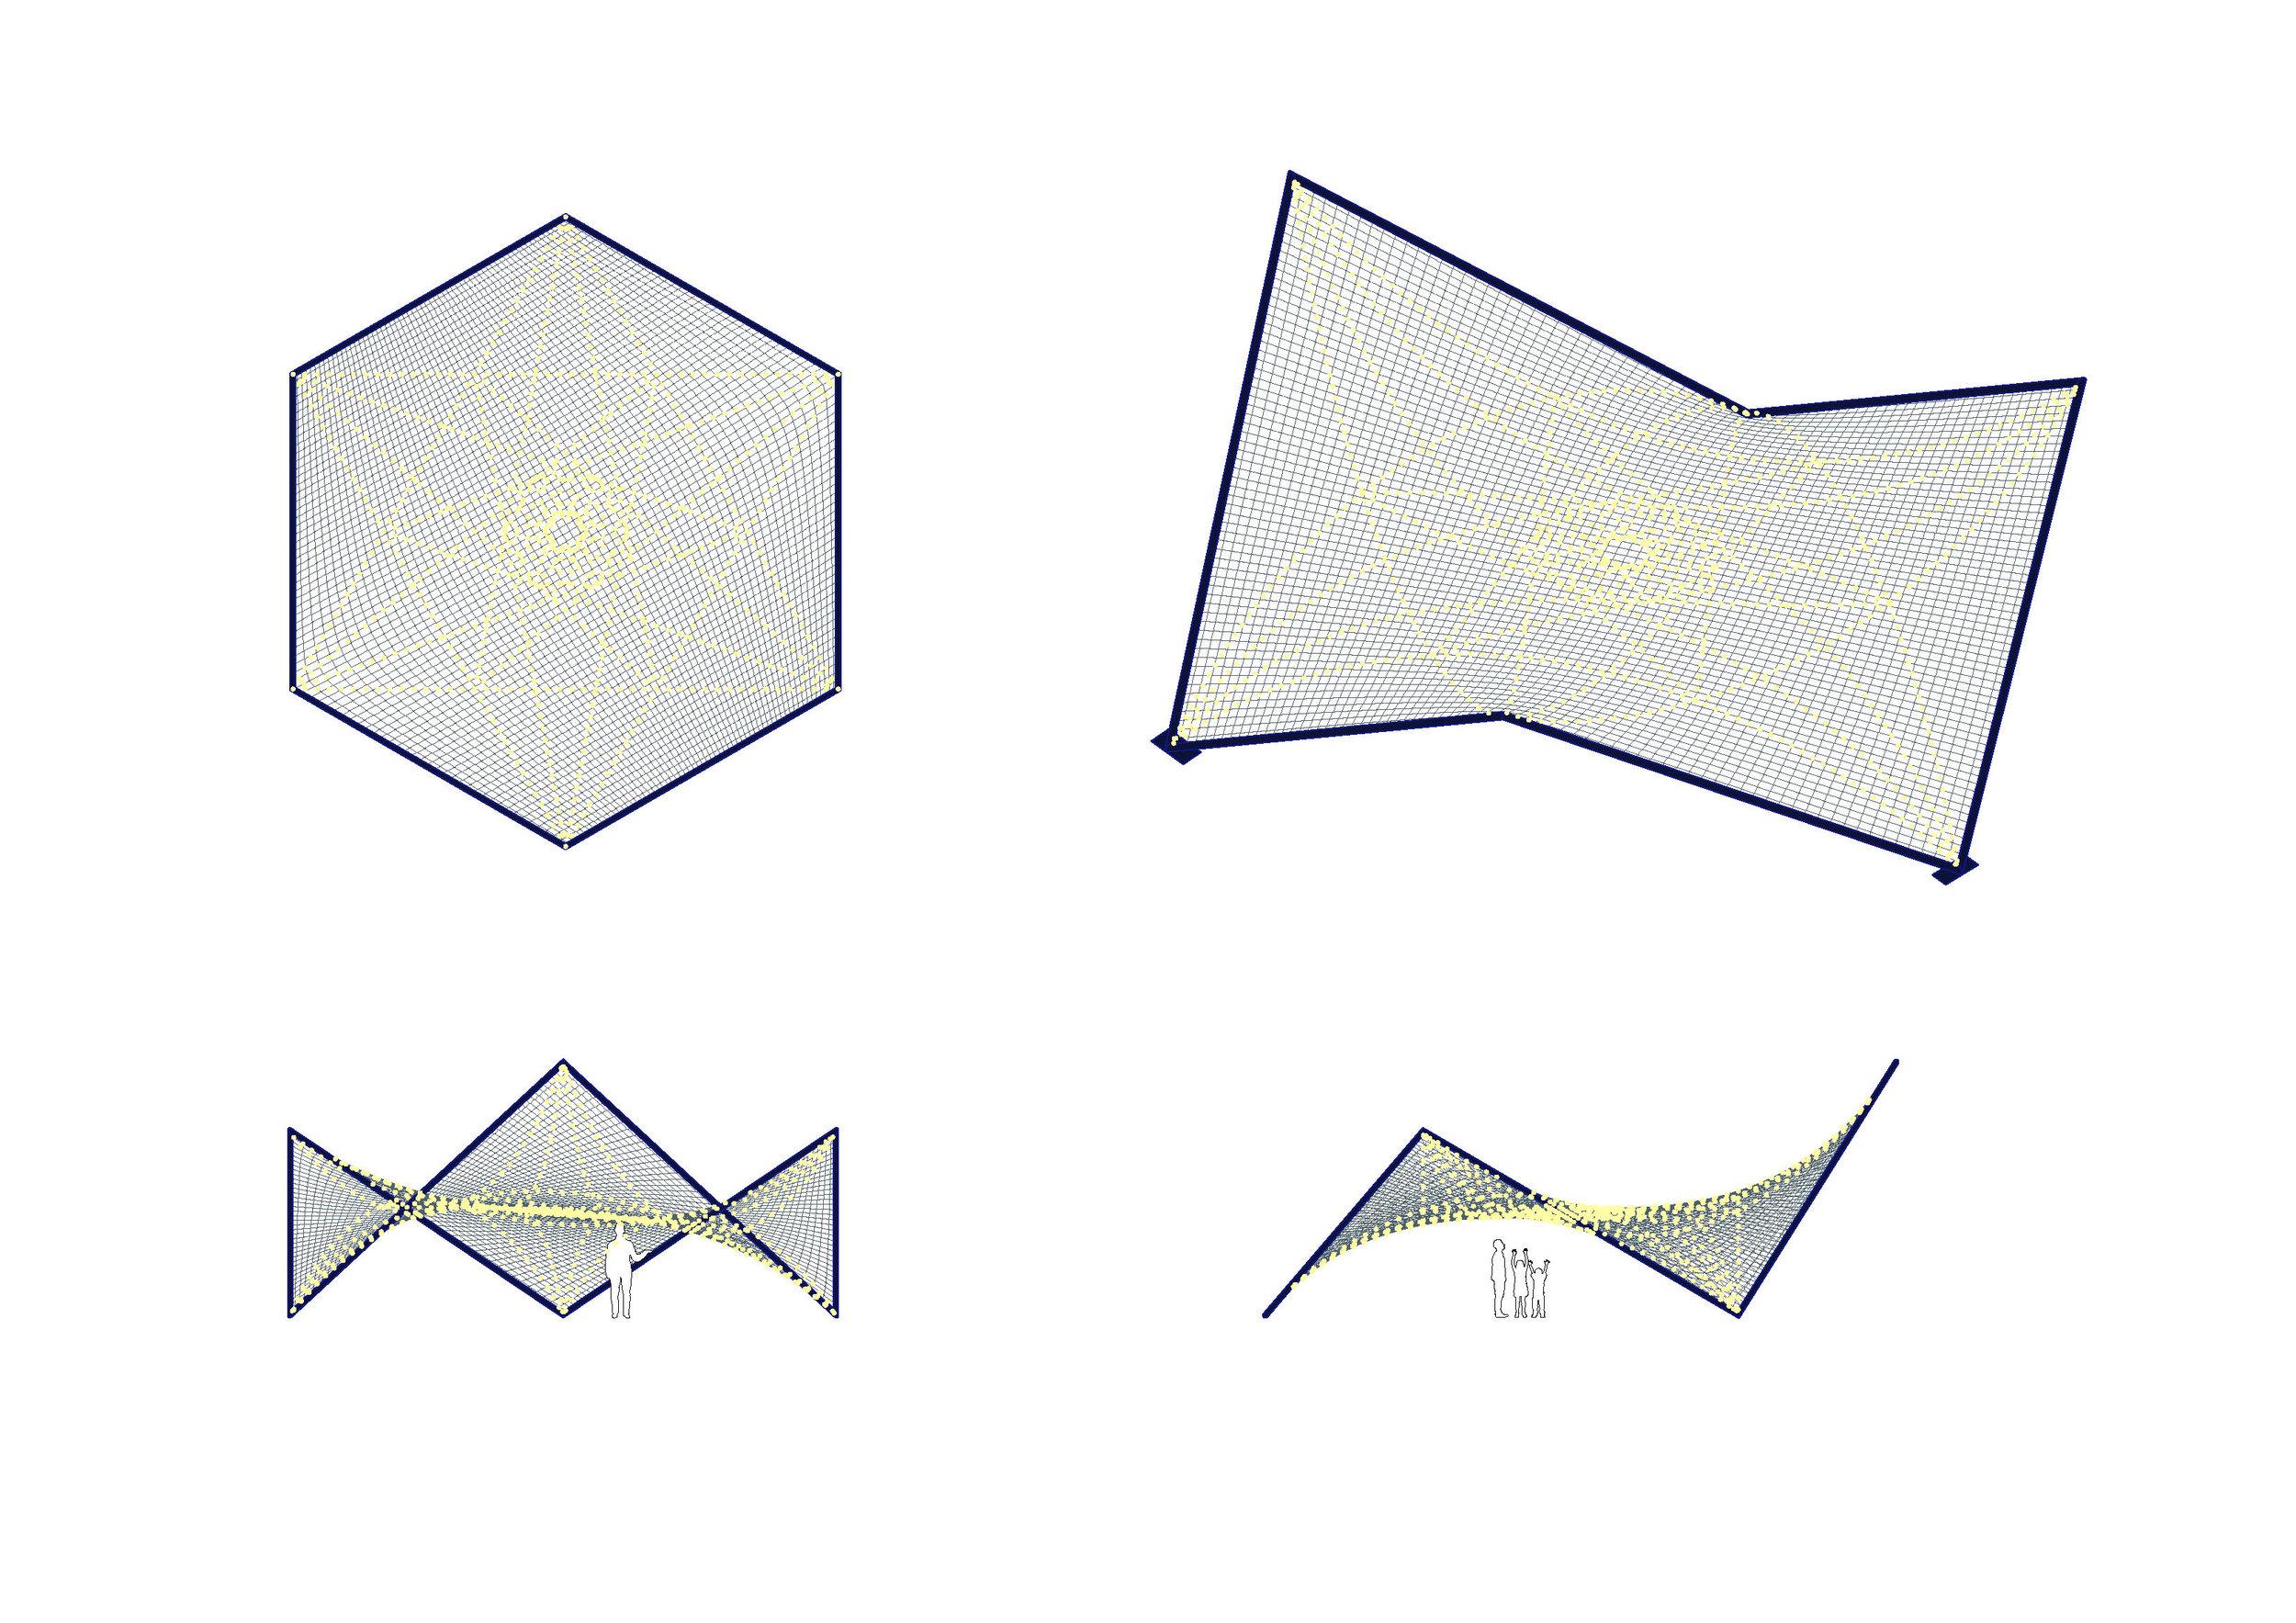 Dreamcatcher Drawings - Small.jpg